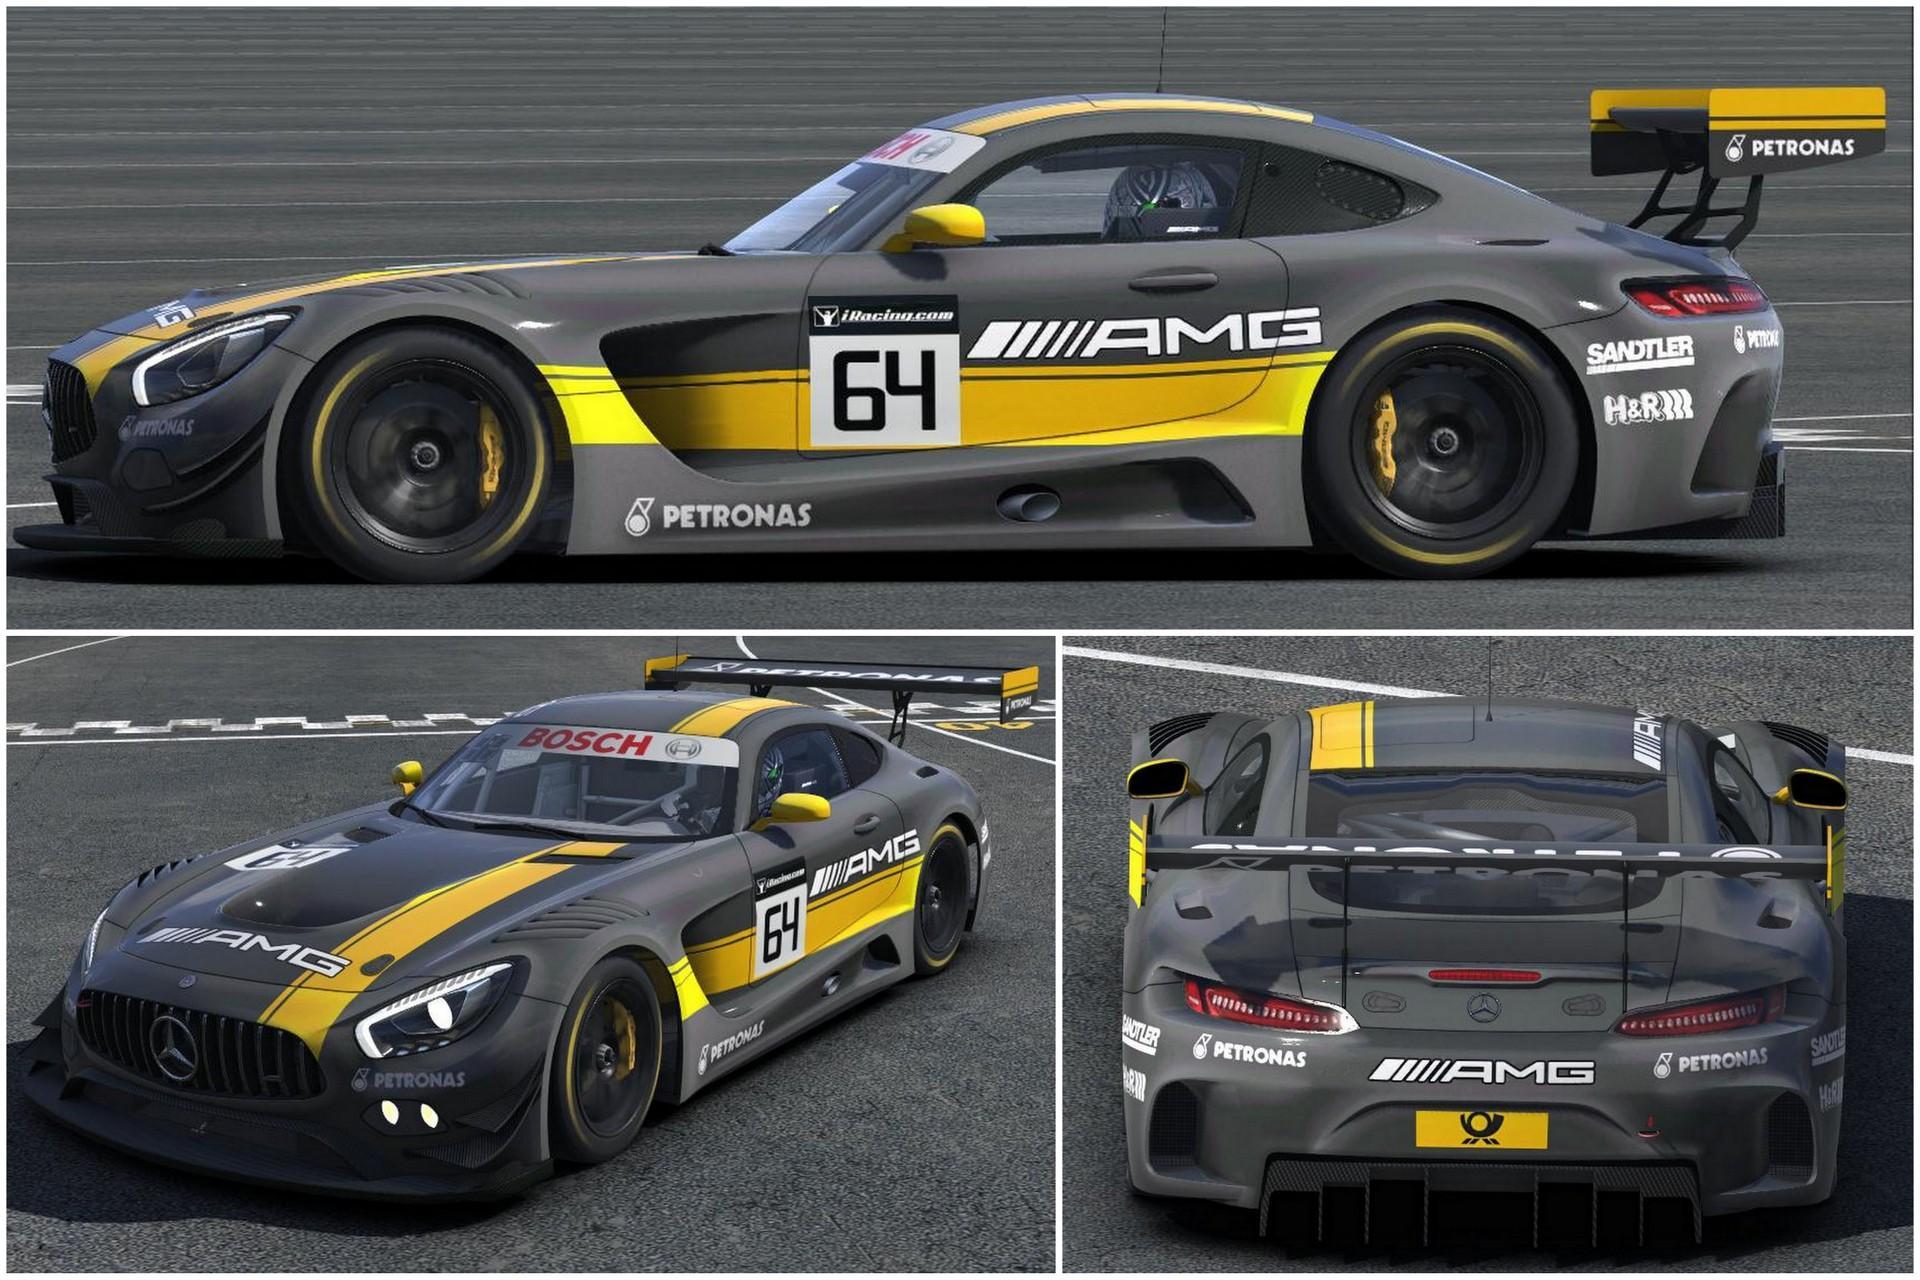 Preview of Mercedes AMG GT3 DiResta AMG by Paul V.